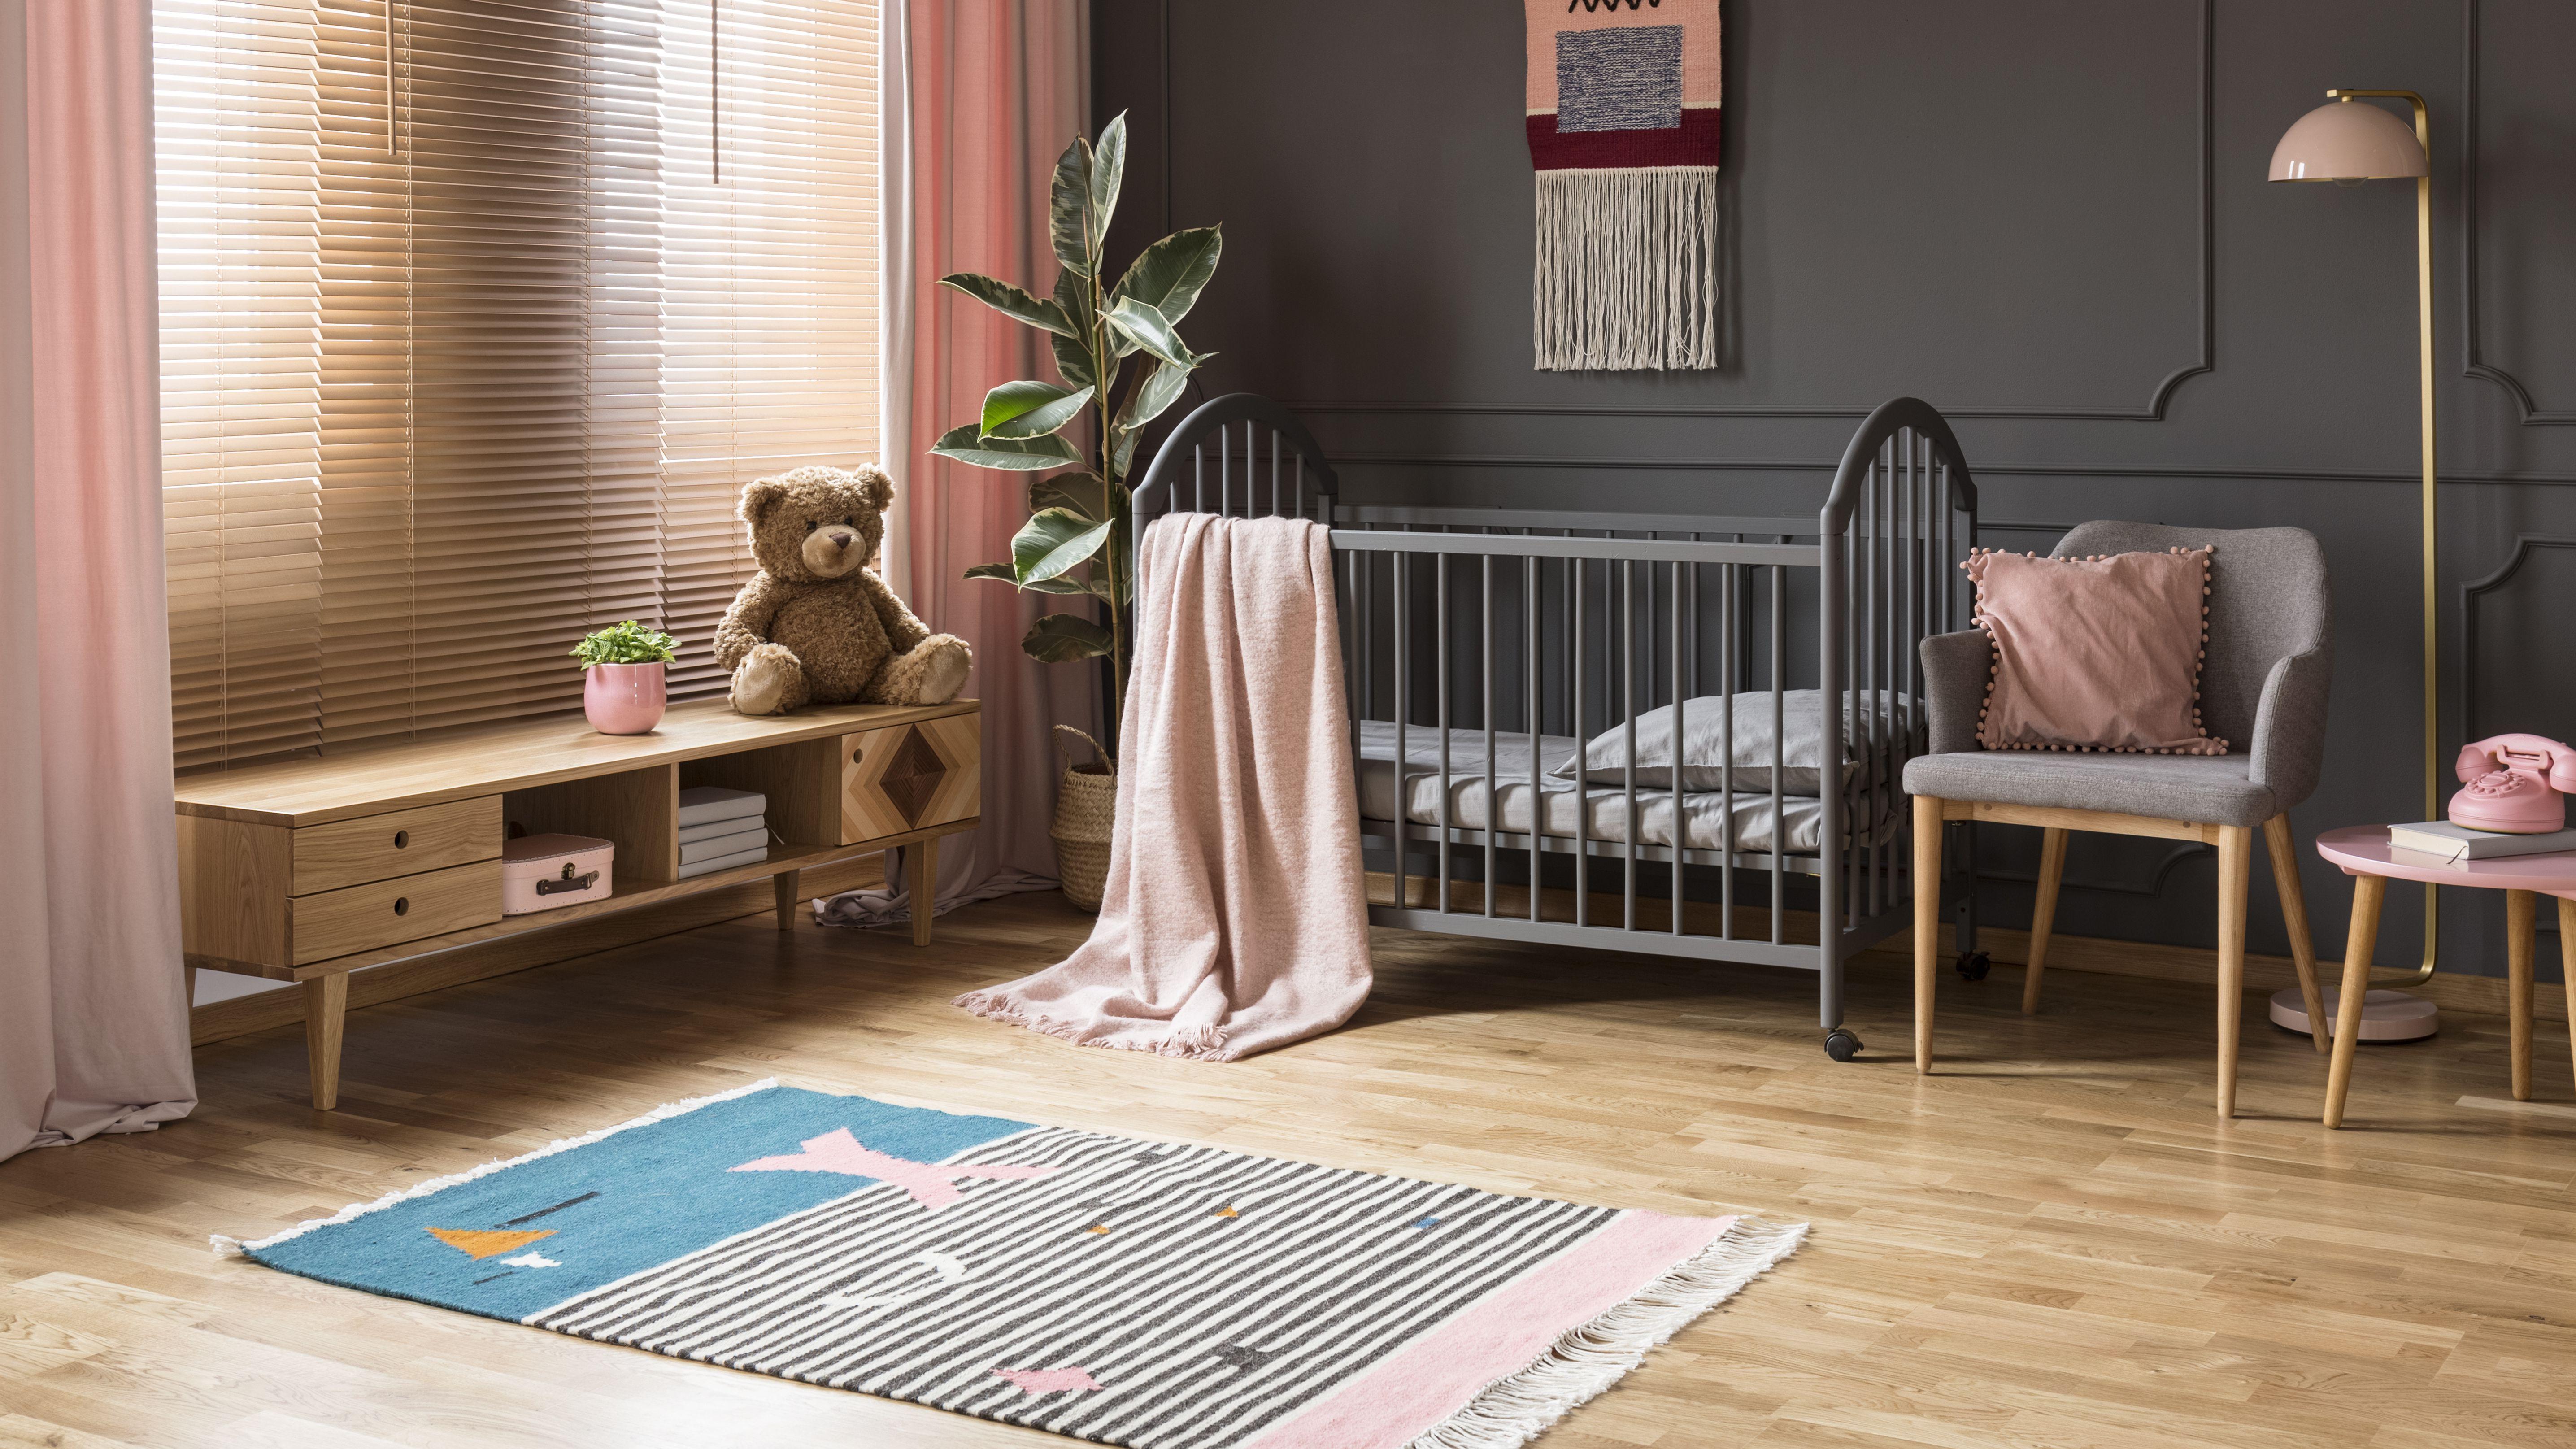 Paint Color Scheme Grey Behr House PNG, Clipart, Art, Bedroom, Behr, Brand,  Color Free PNG Download